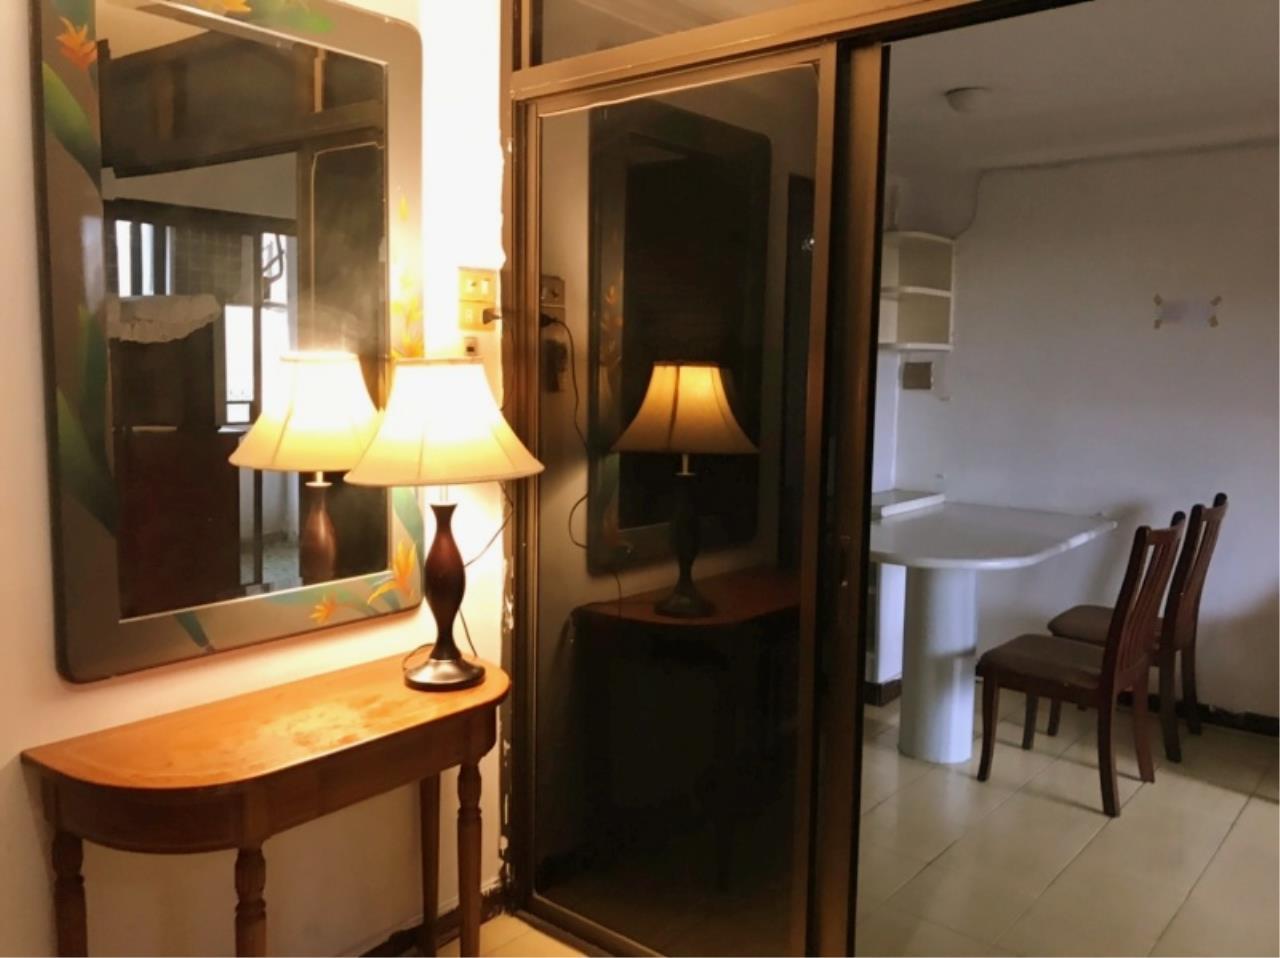 Century21 Skylux Agency's Ruenrudee Condominium / Condo For Sale / 1 Bedroom / 44 SQM / BTS Phloen Chit / Bangkok 3